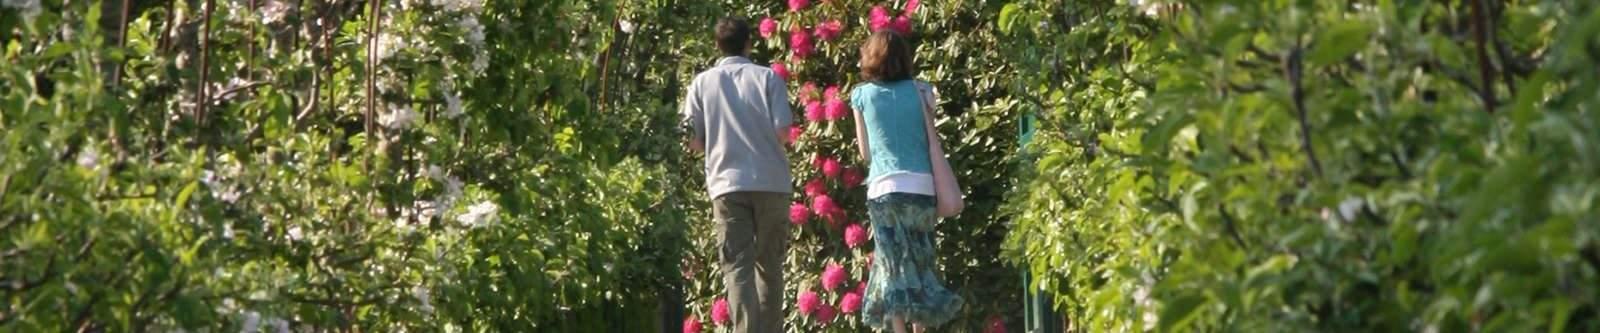 couple walking through apple arches